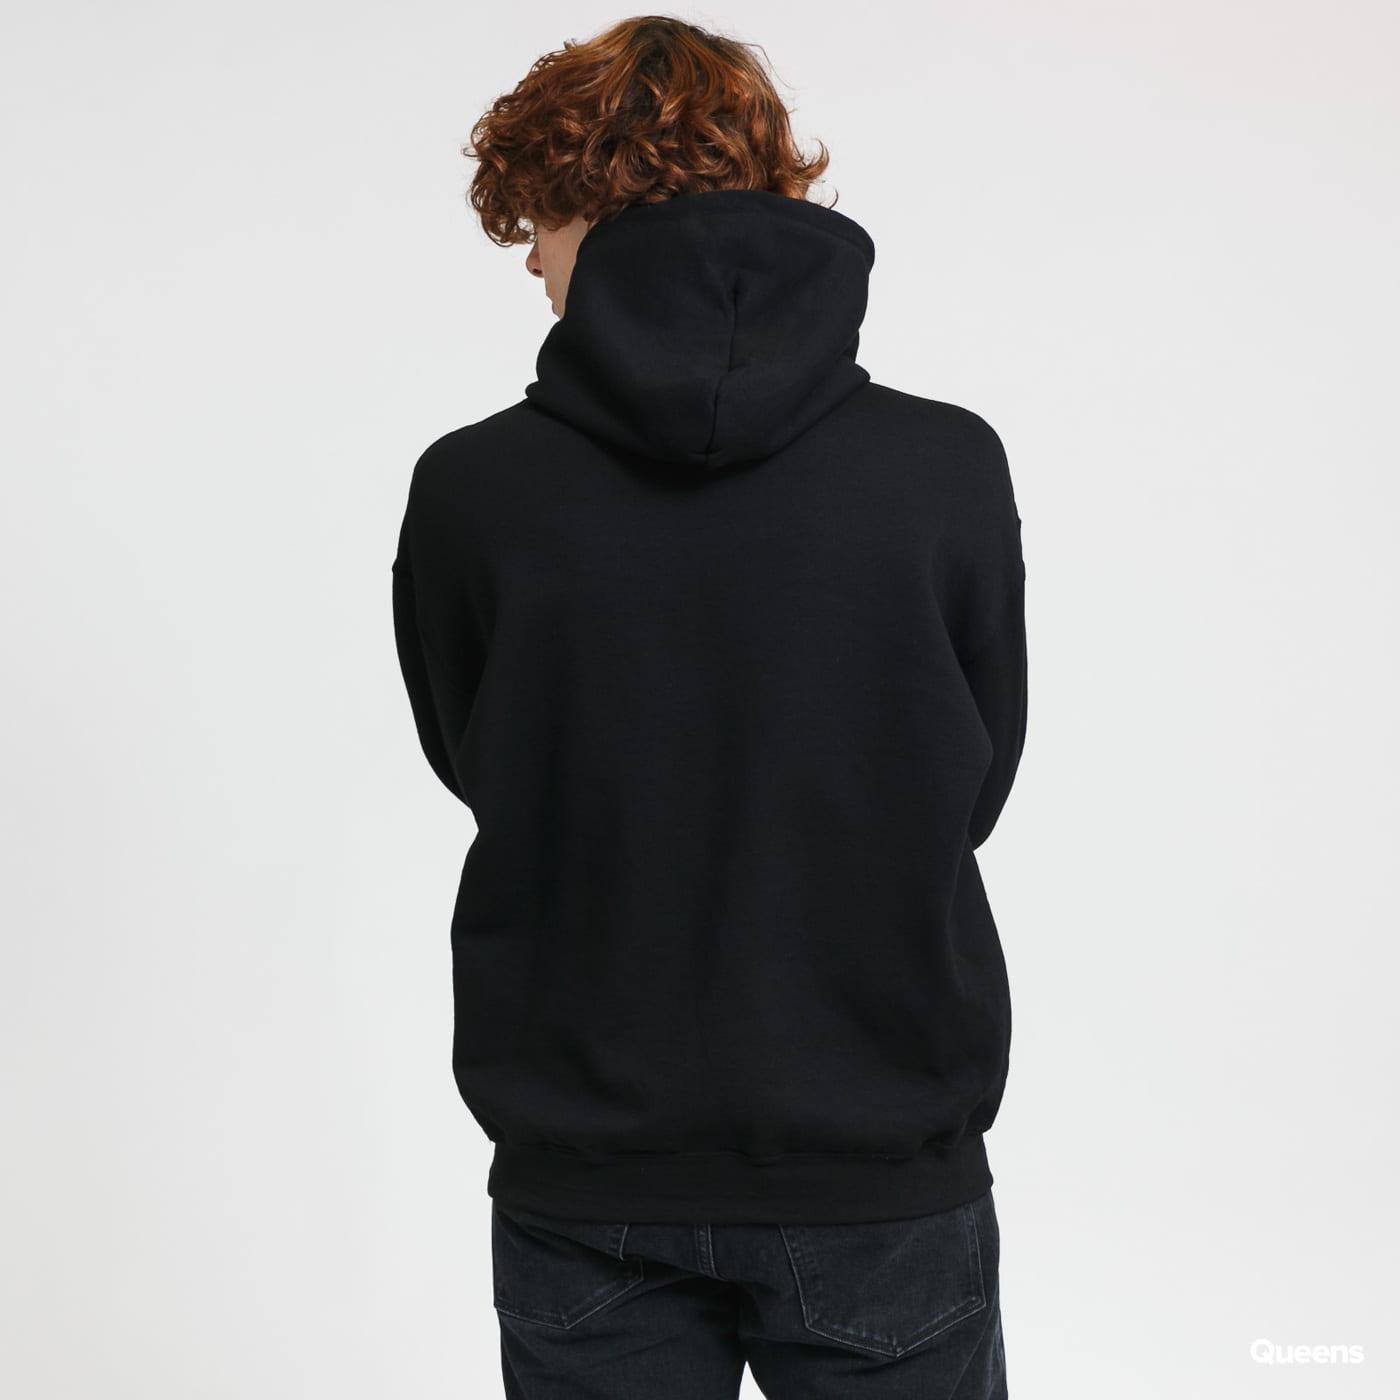 The Quiet Life Origin Embroidered Hoodie black